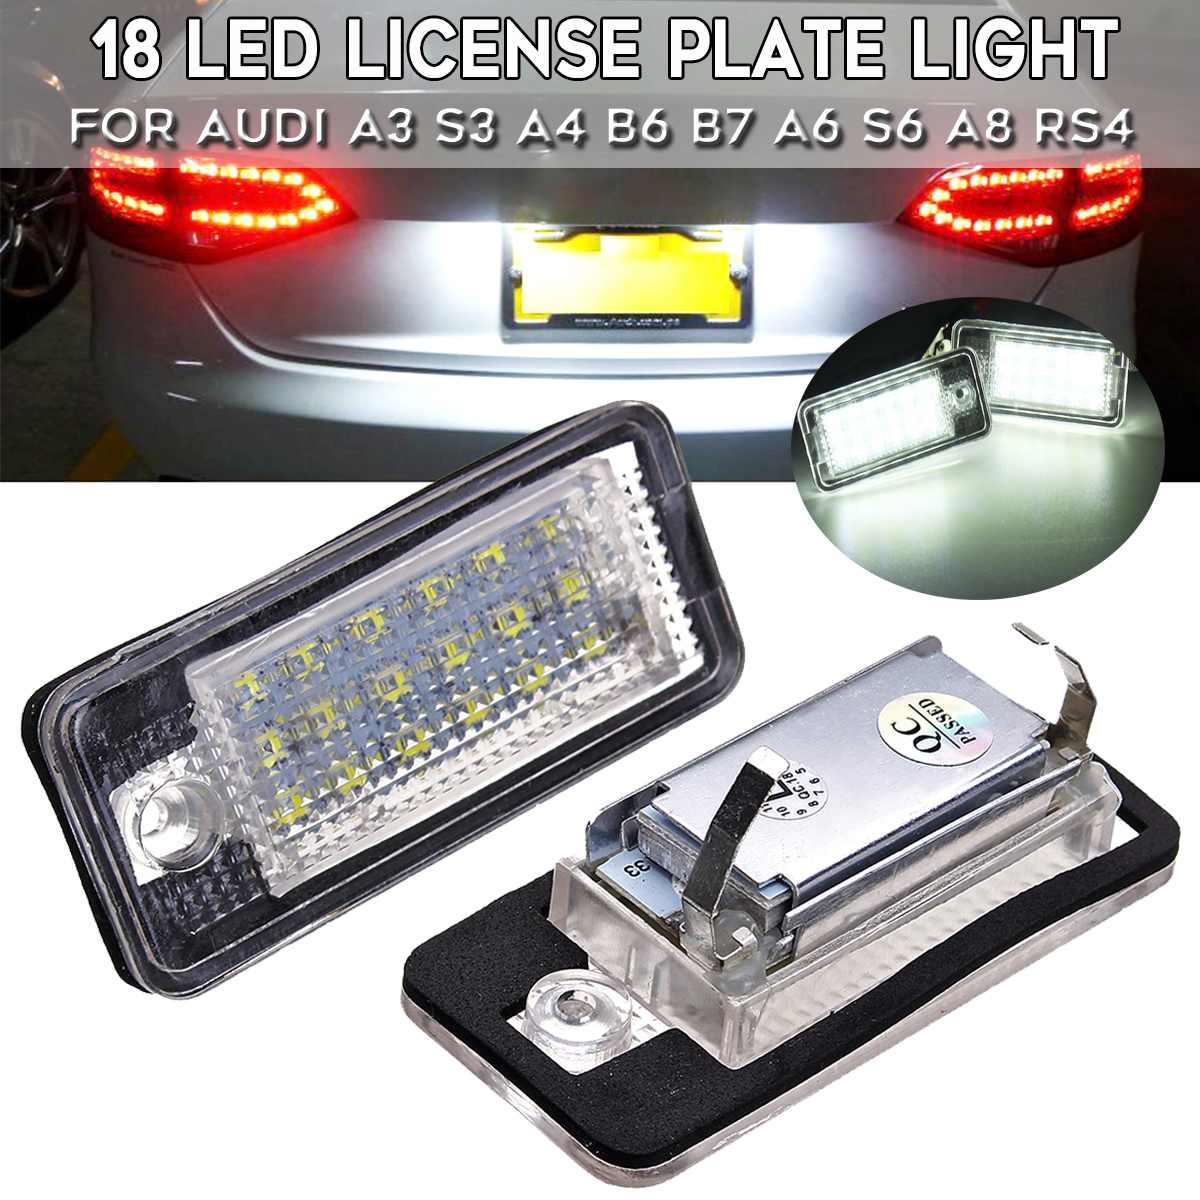 2pcs License Number Plate Light 18LED Error Free For Audi A3 S3 A4 B6 B7 A6 S6 A8 RS4  8E0807430A 8E0807430B 8E0943021B 8E0943022pcs License Number Plate Light 18LED Error Free For Audi A3 S3 A4 B6 B7 A6 S6 A8 RS4  8E0807430A 8E0807430B 8E0943021B 8E094302